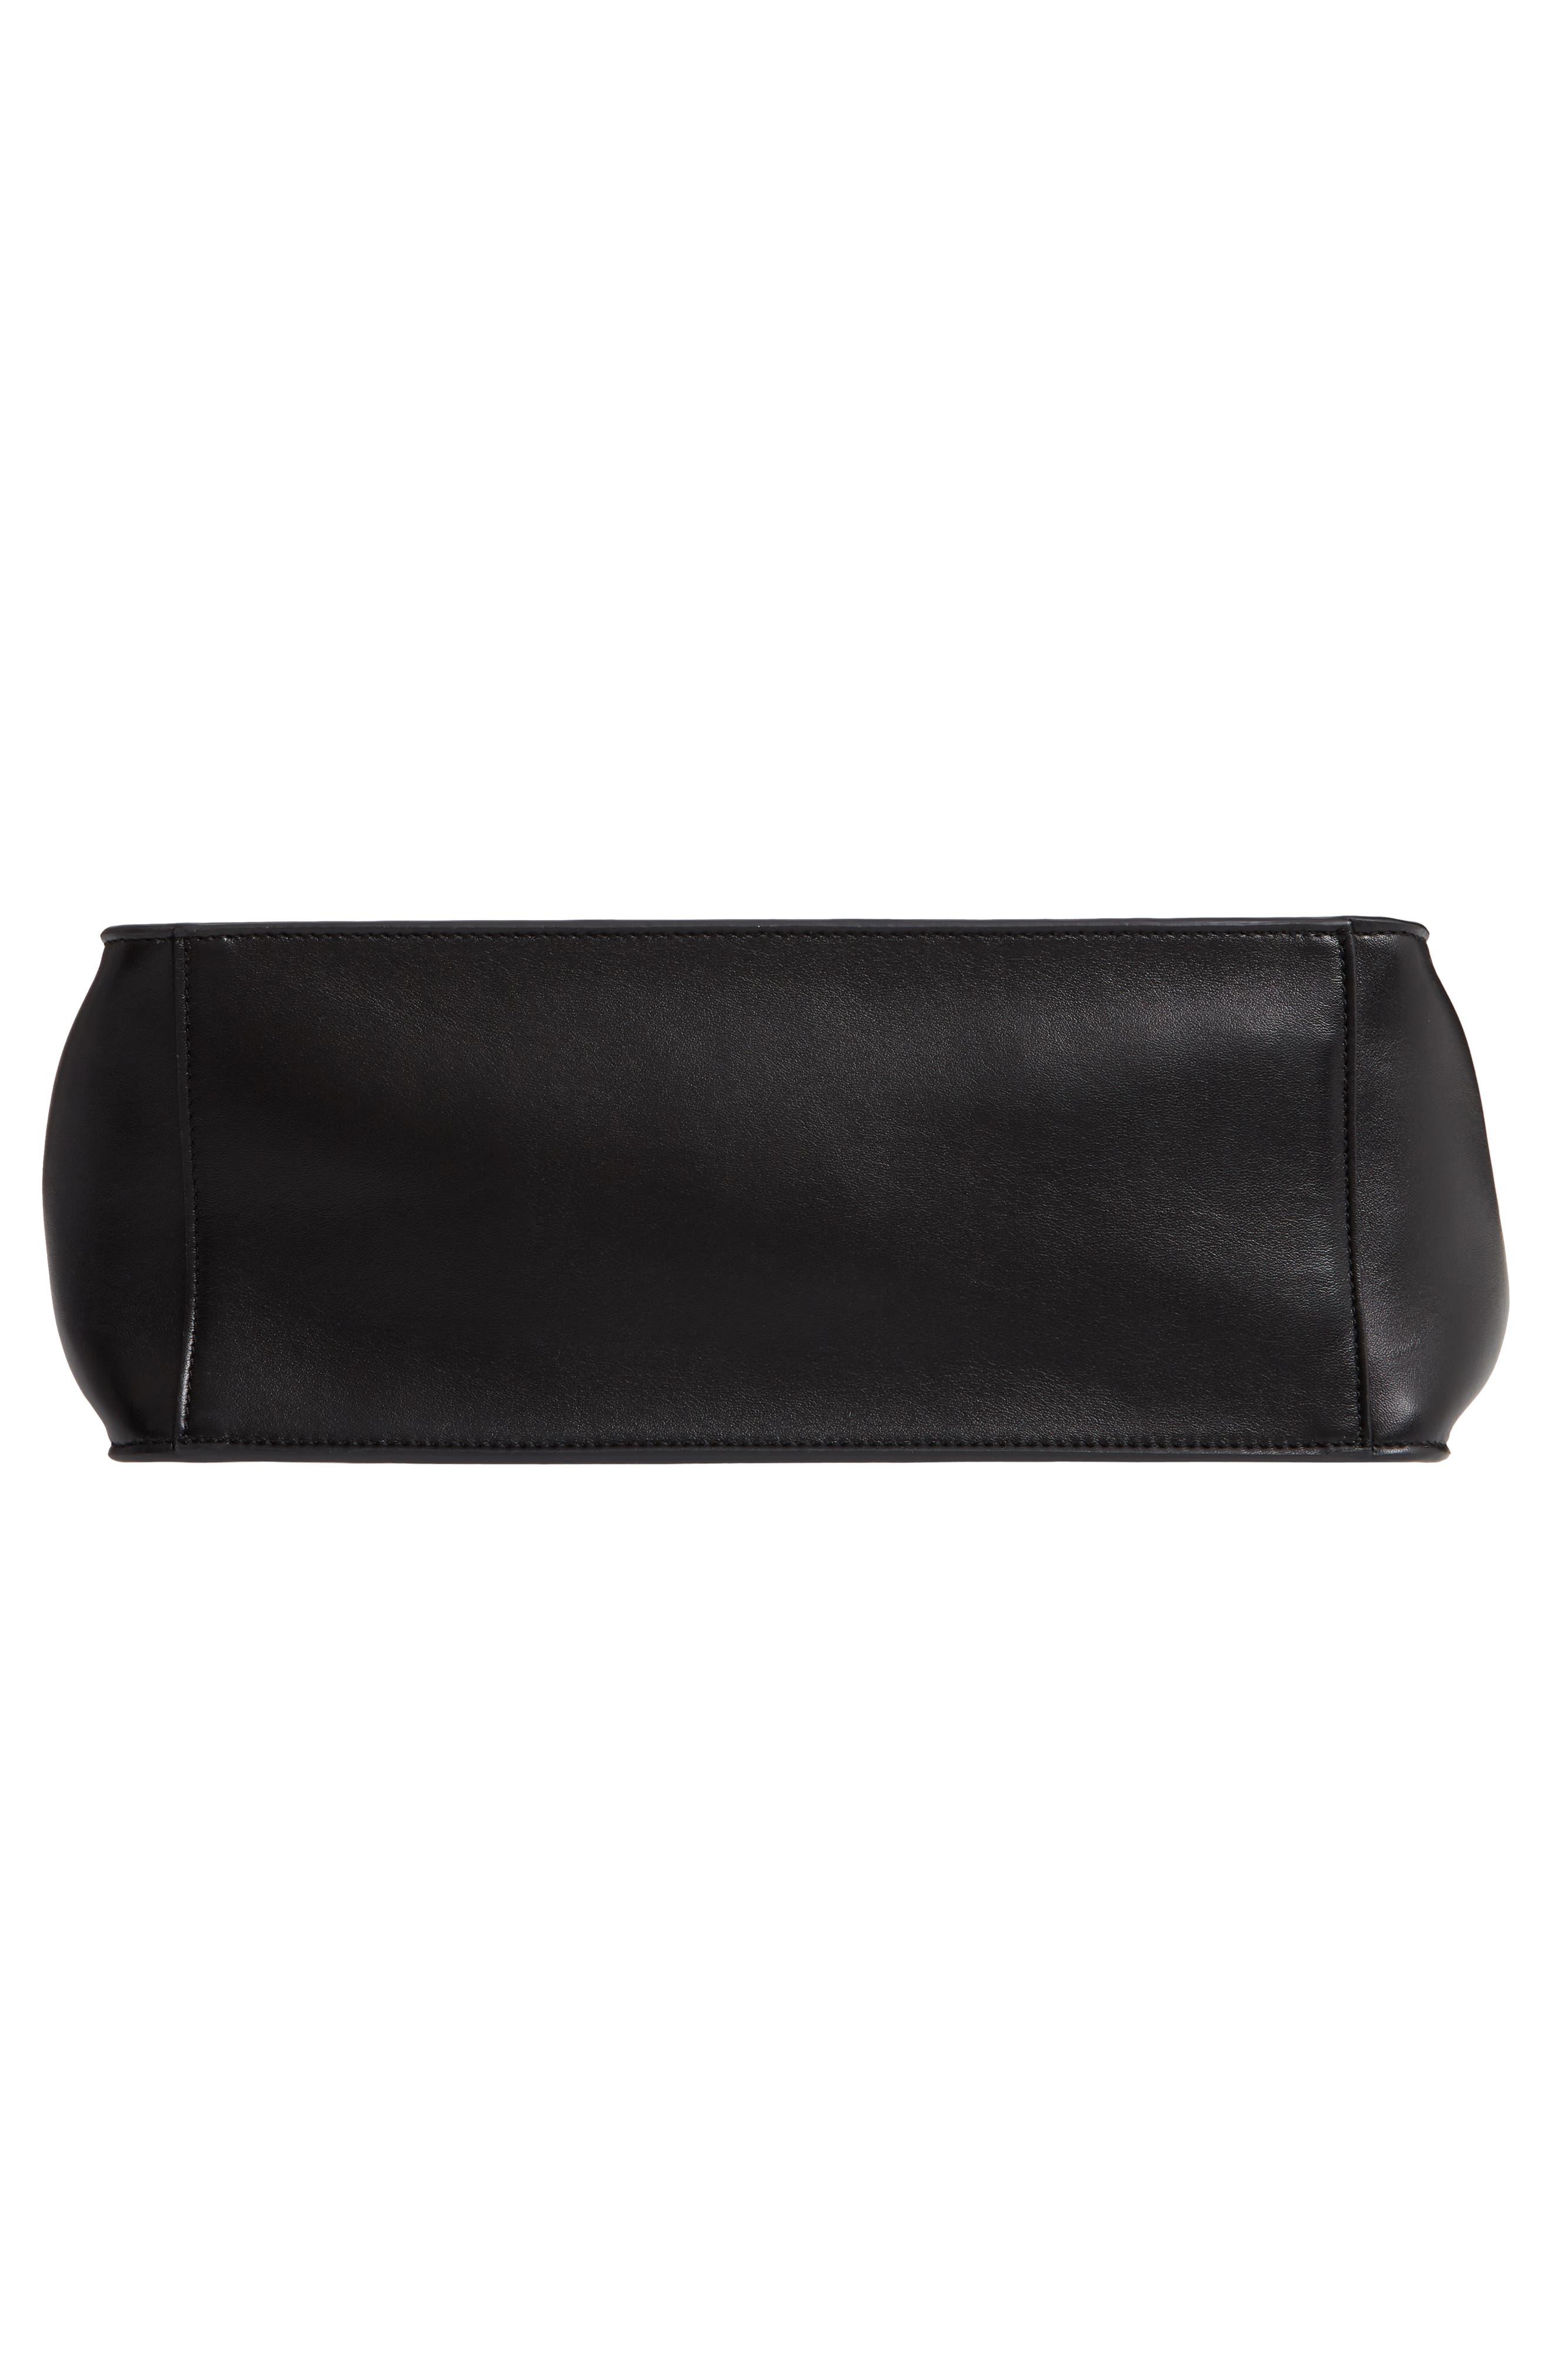 STELLA MCCARTNEY, Perforated Logo Faux Leather Satchel, Alternate thumbnail 6, color, BLACK